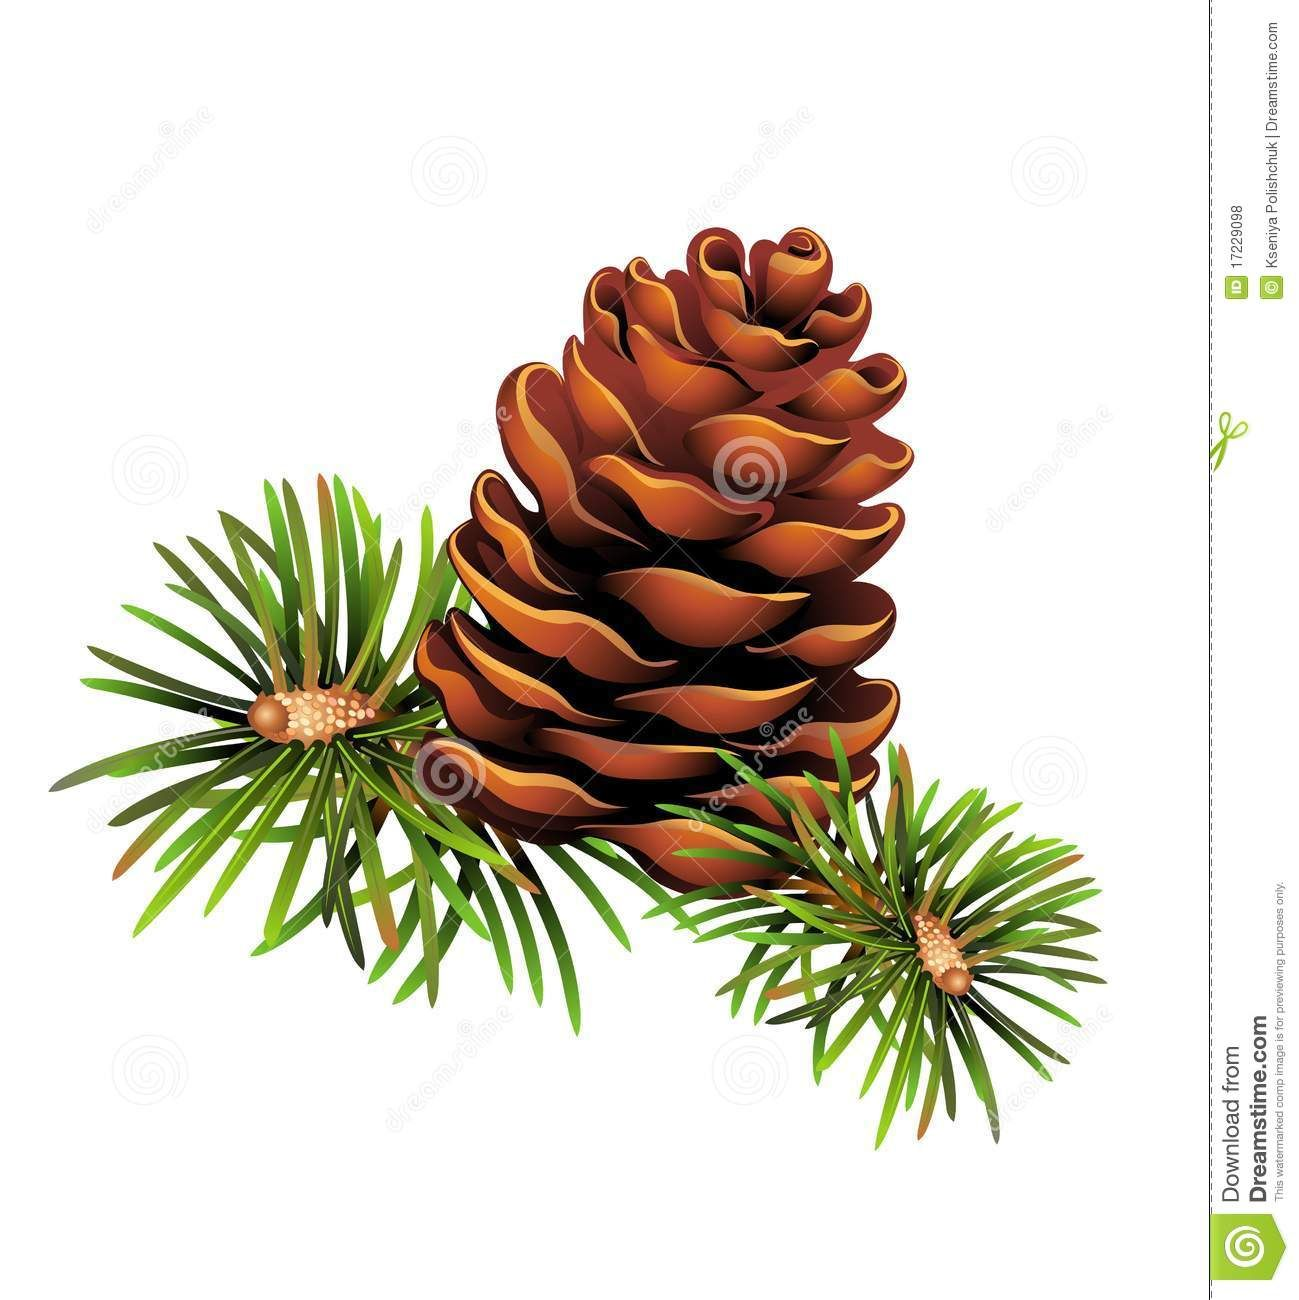 christmas pine cone drawing - photo #2